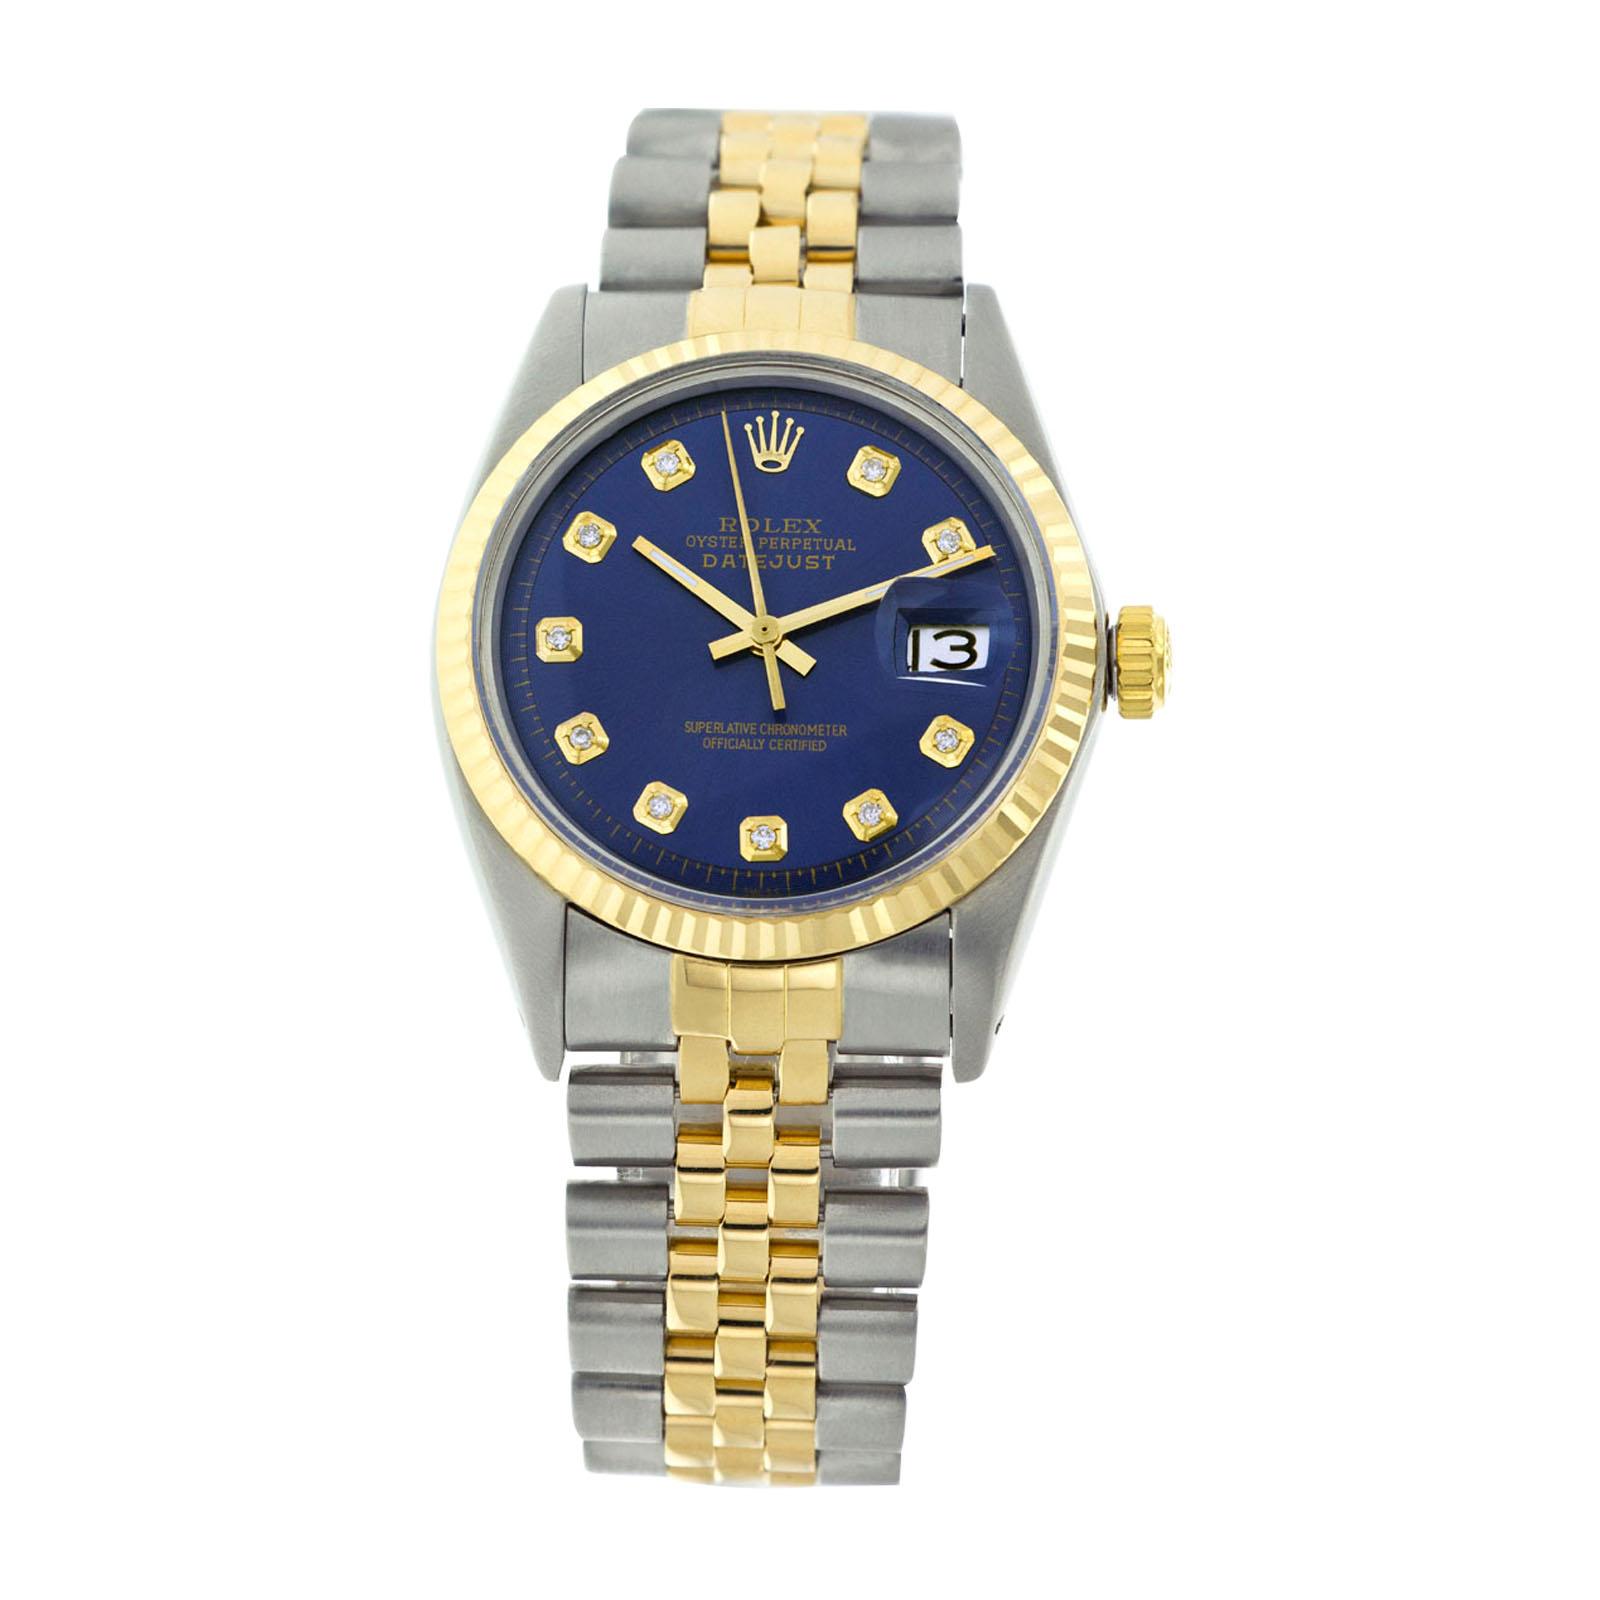 e340c9f67f0 Rolex Mens Datejust 16013 Blue Diamond Dial Fluted Bezel 36mm Watch ...